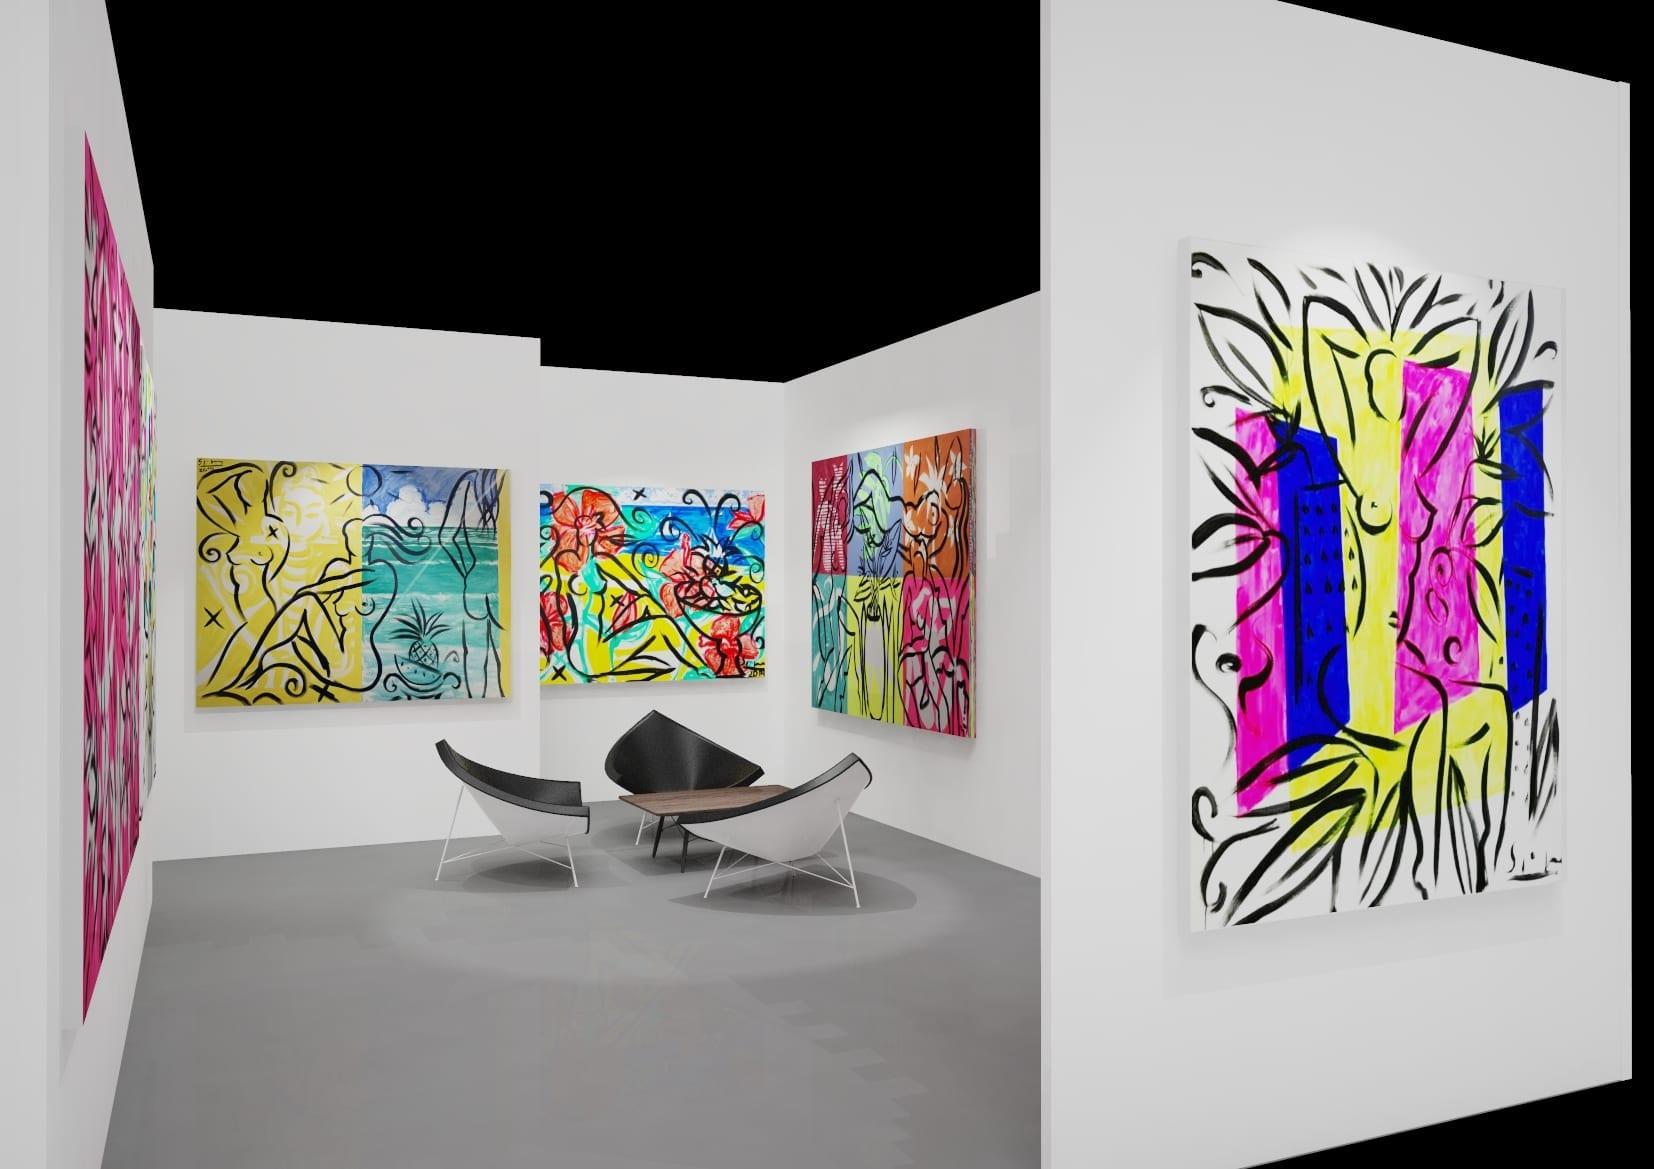 Art Basel Miami | Paintings by Stefan Szczesny | 2019 | Acrylic on Canvas | buy online | Szczesny Art Shop